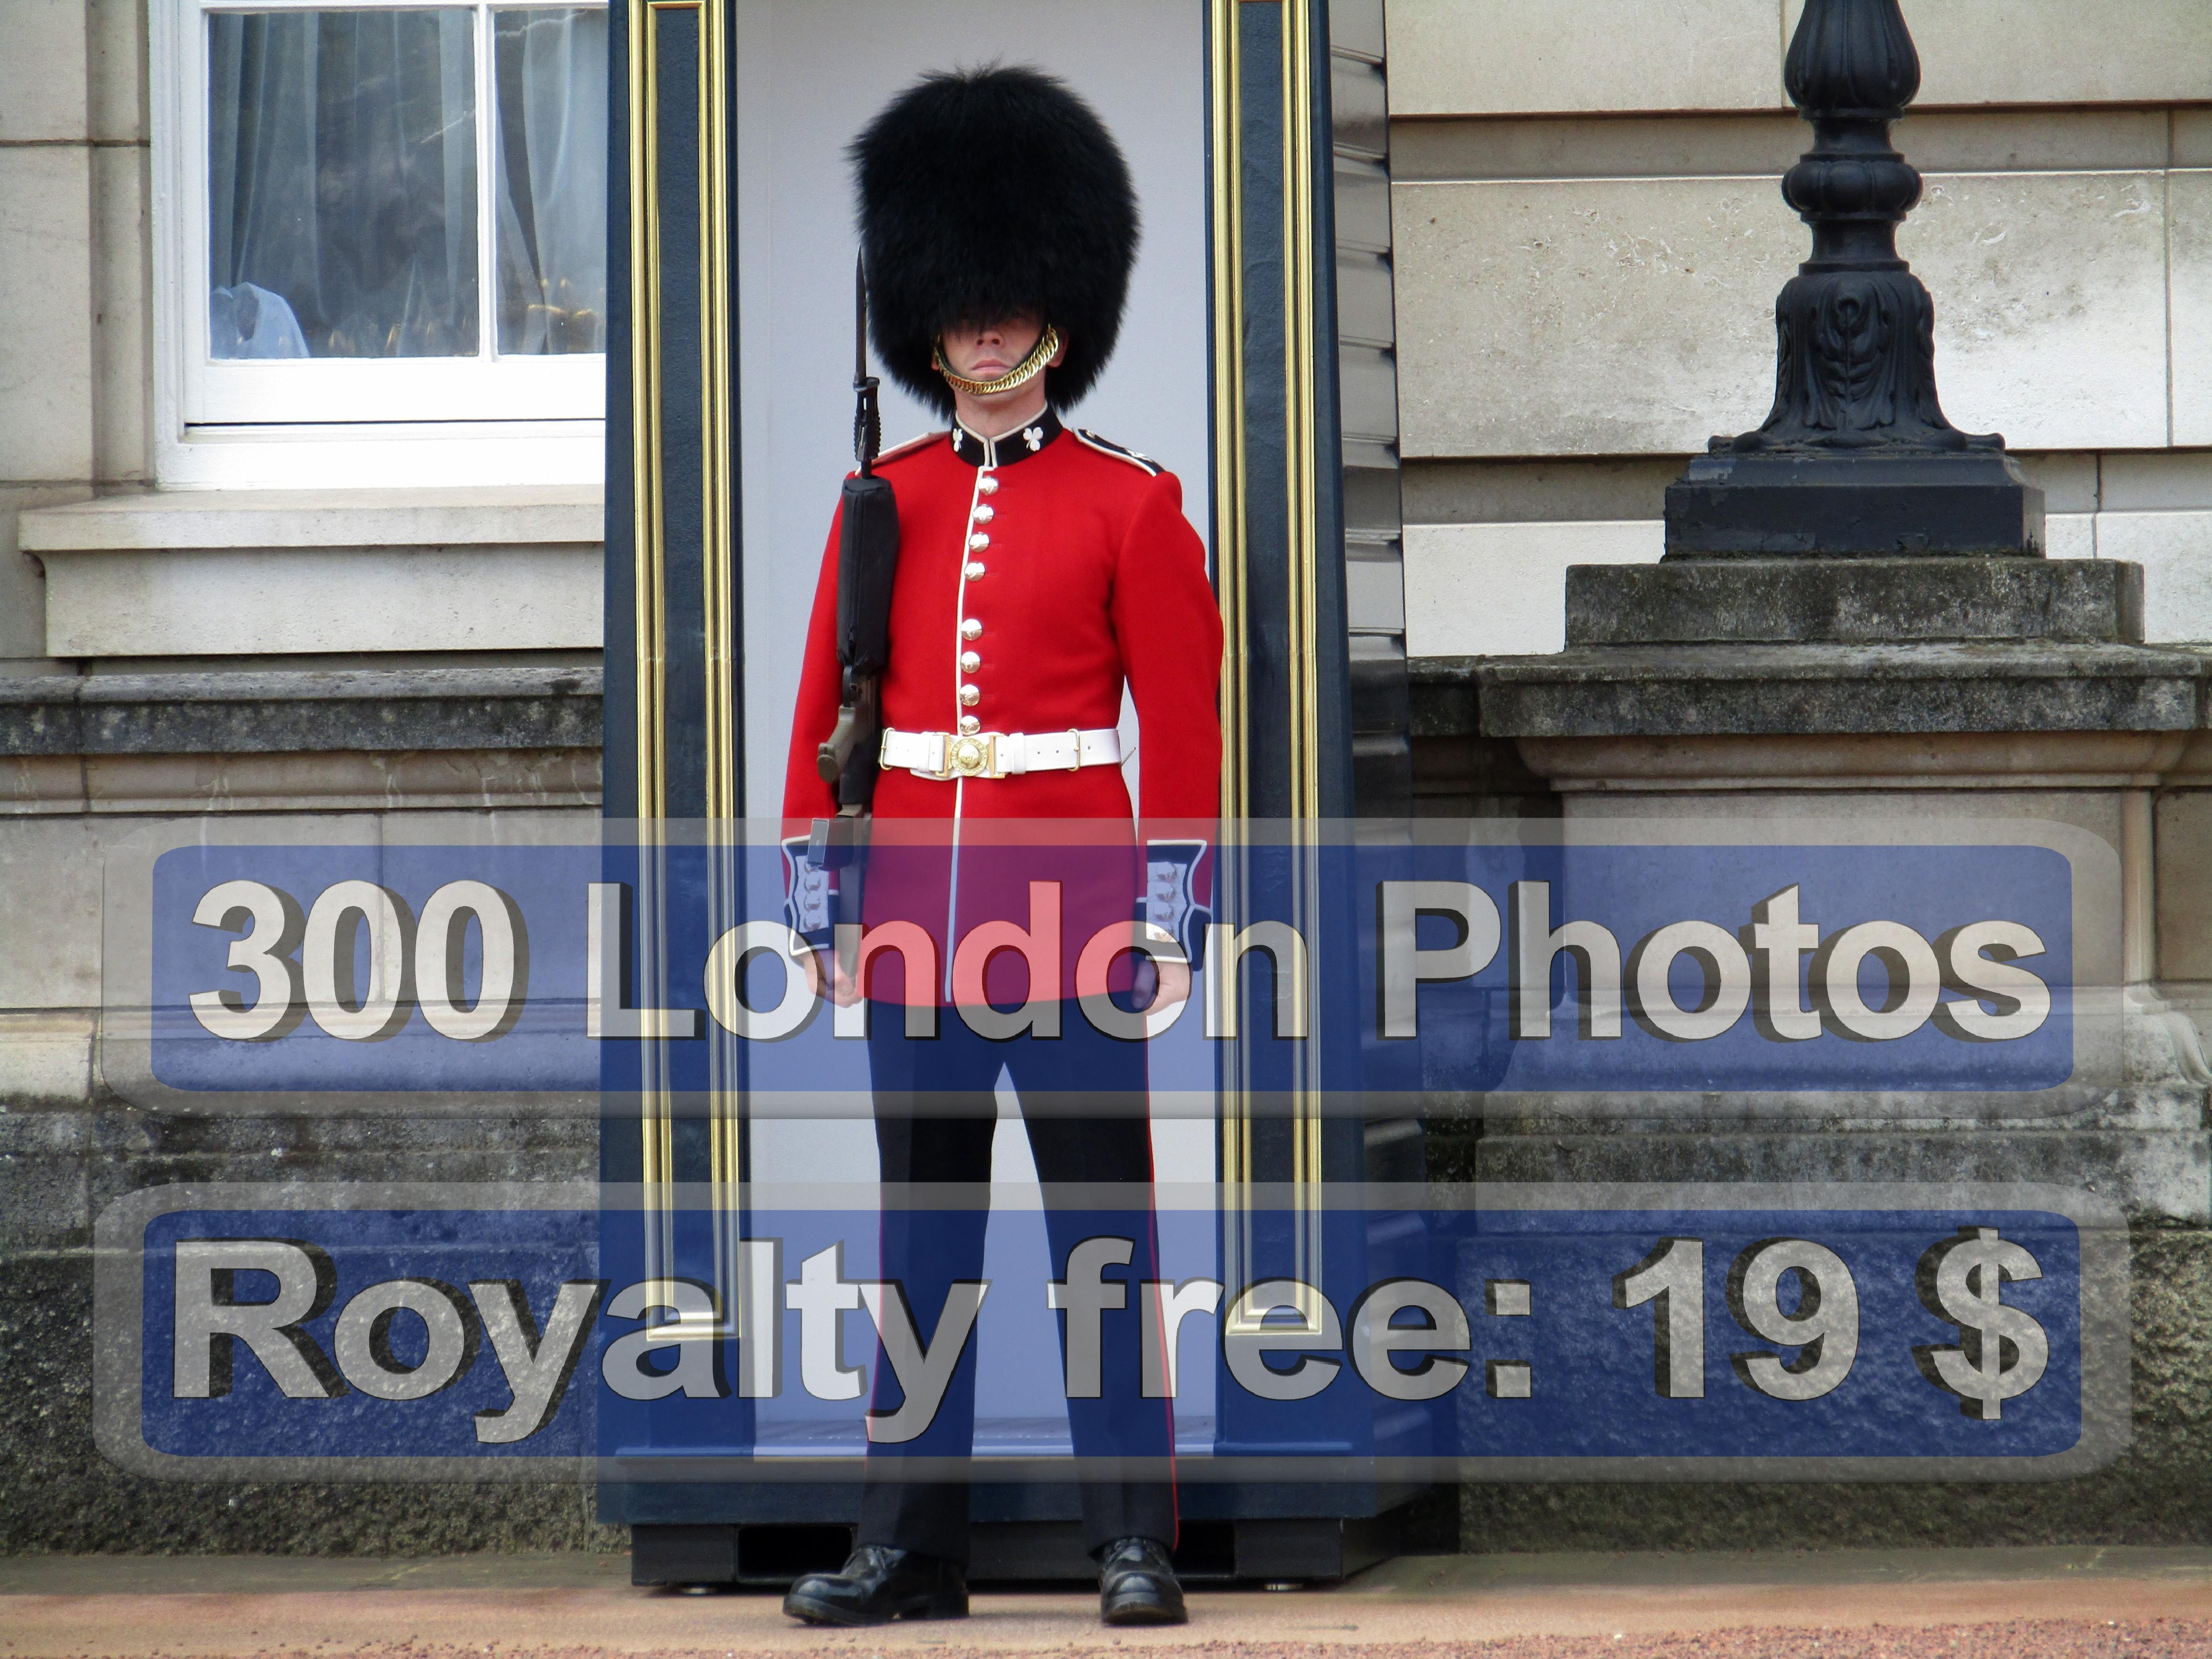 London Photo 4k